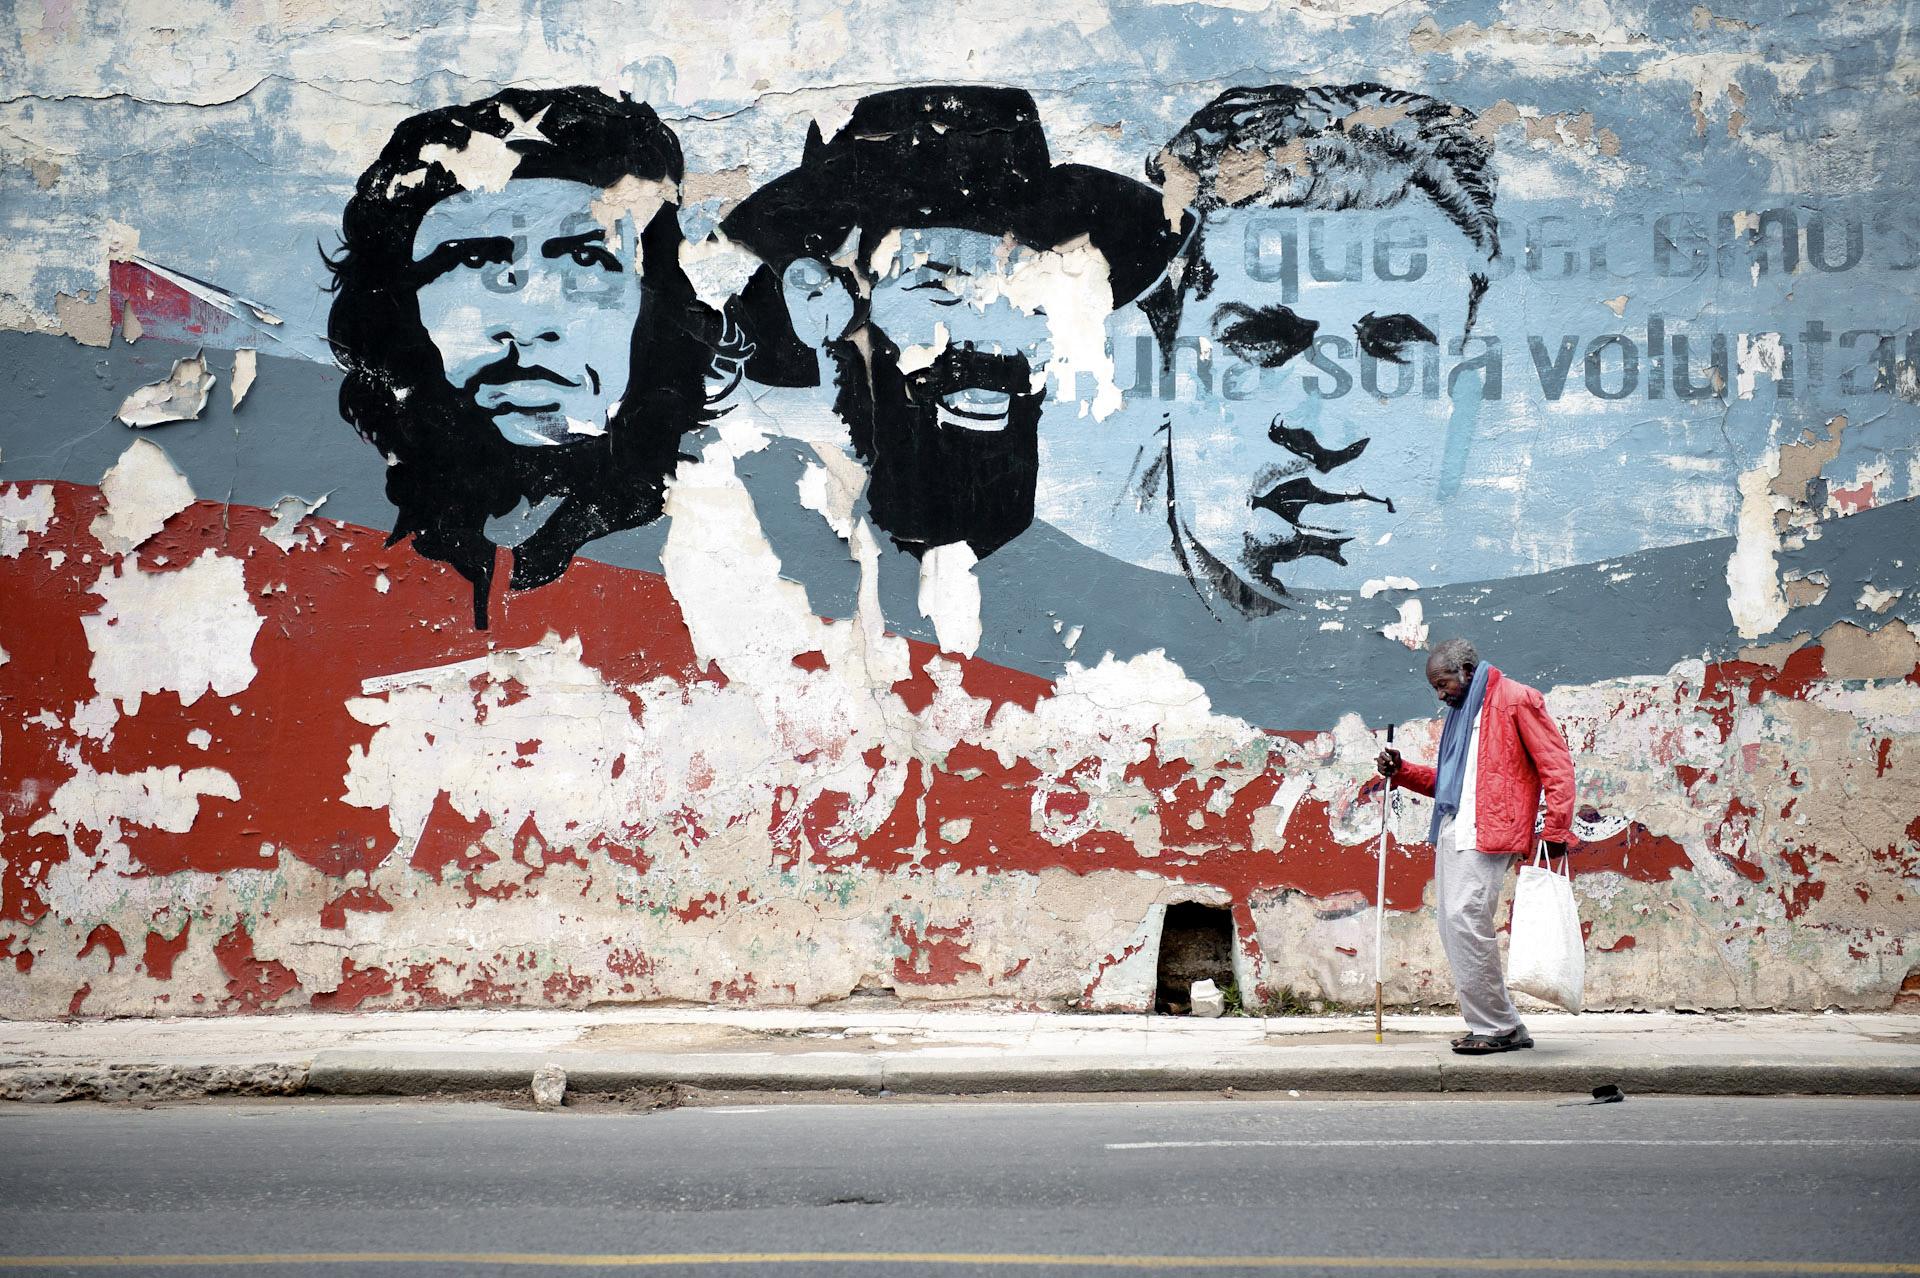 Jason_Bax_Travel_Cuba_Havana_Revolution_Che_Mural.jpg